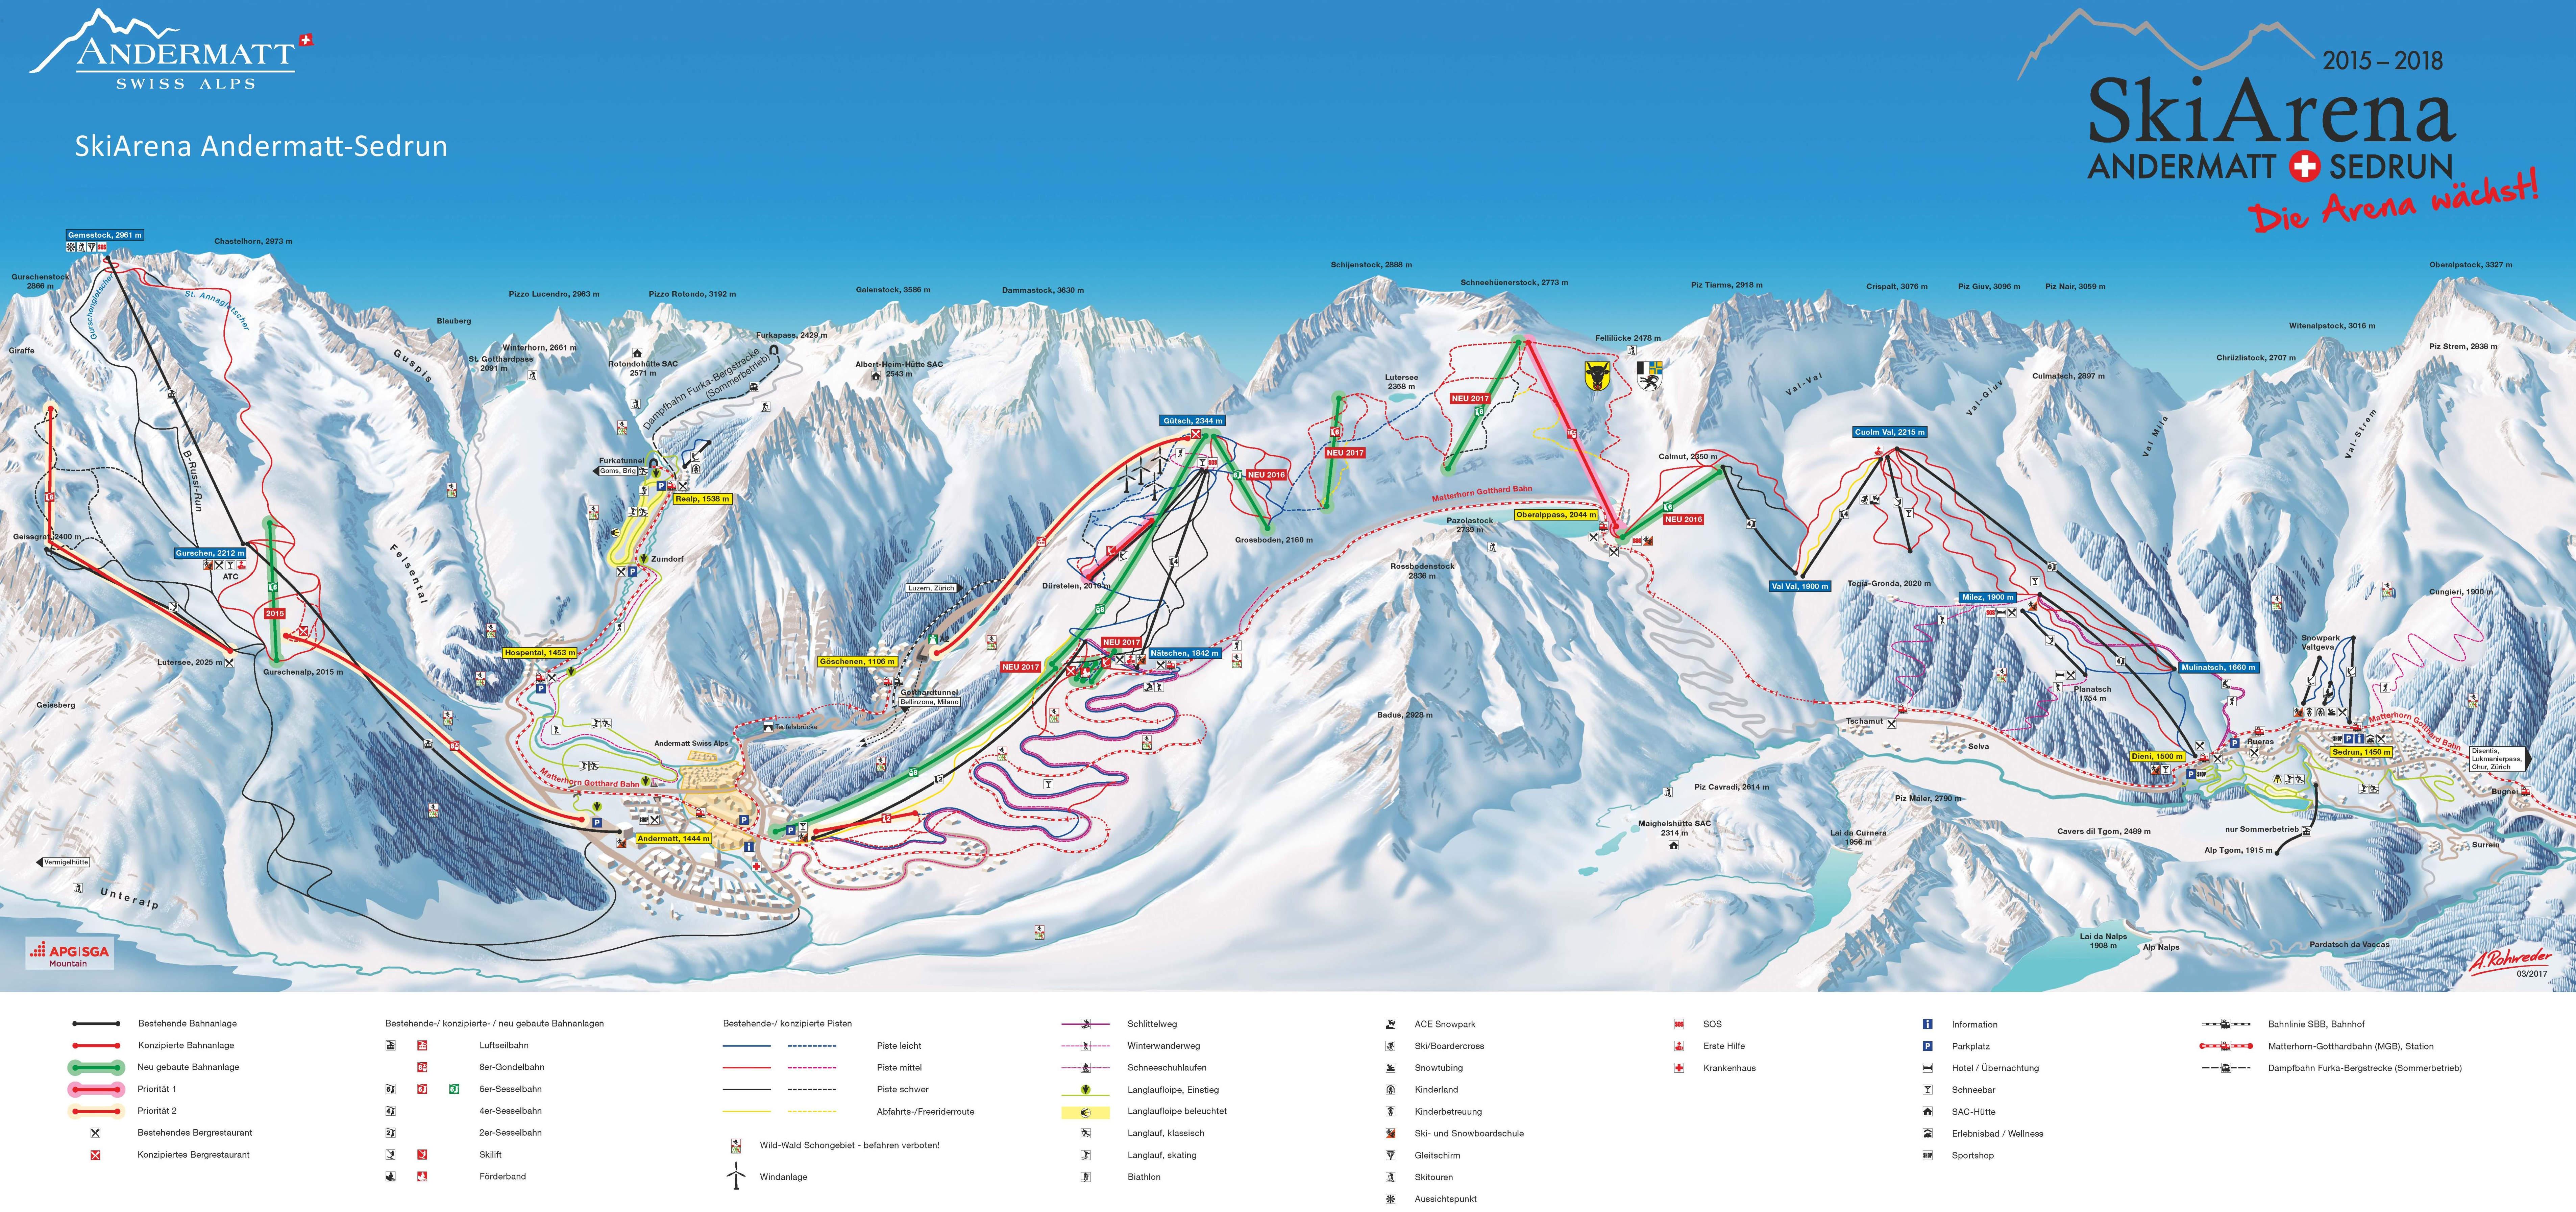 SkiArena - Andermatt Sedrun Mapa pistas